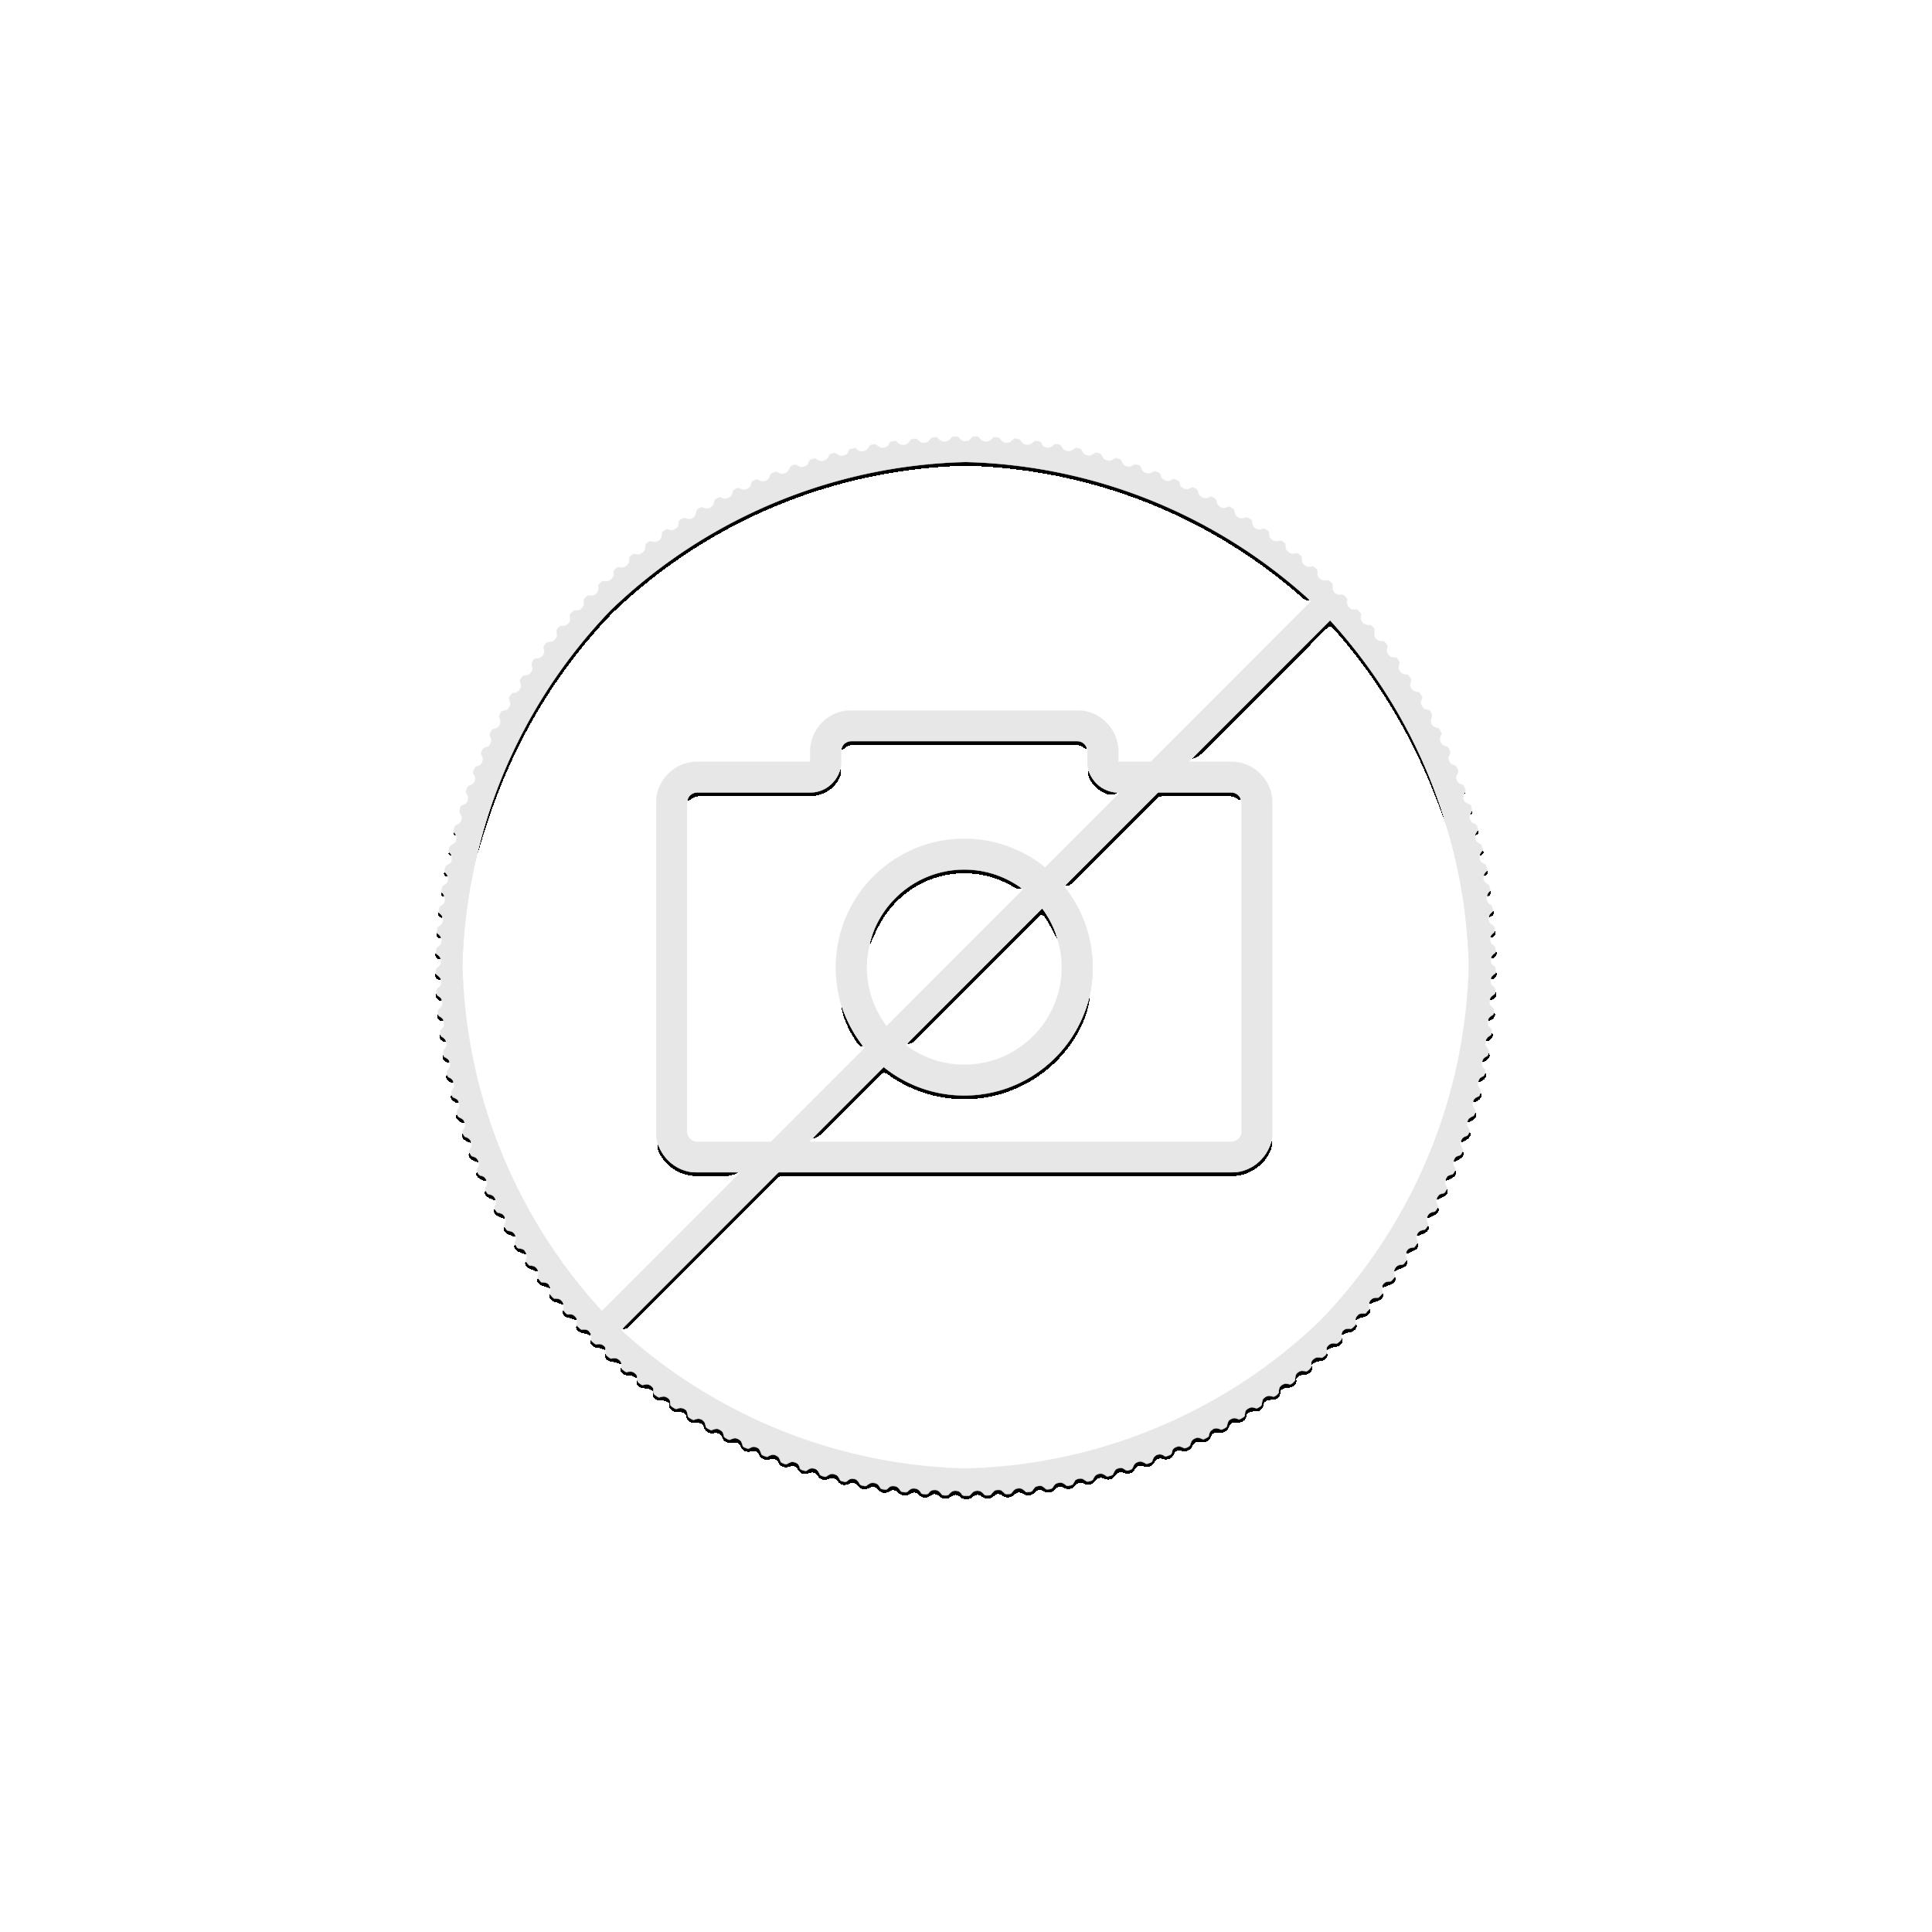 3 troy ounce zilveren munt St. Michael en de Dragon Apocalypse